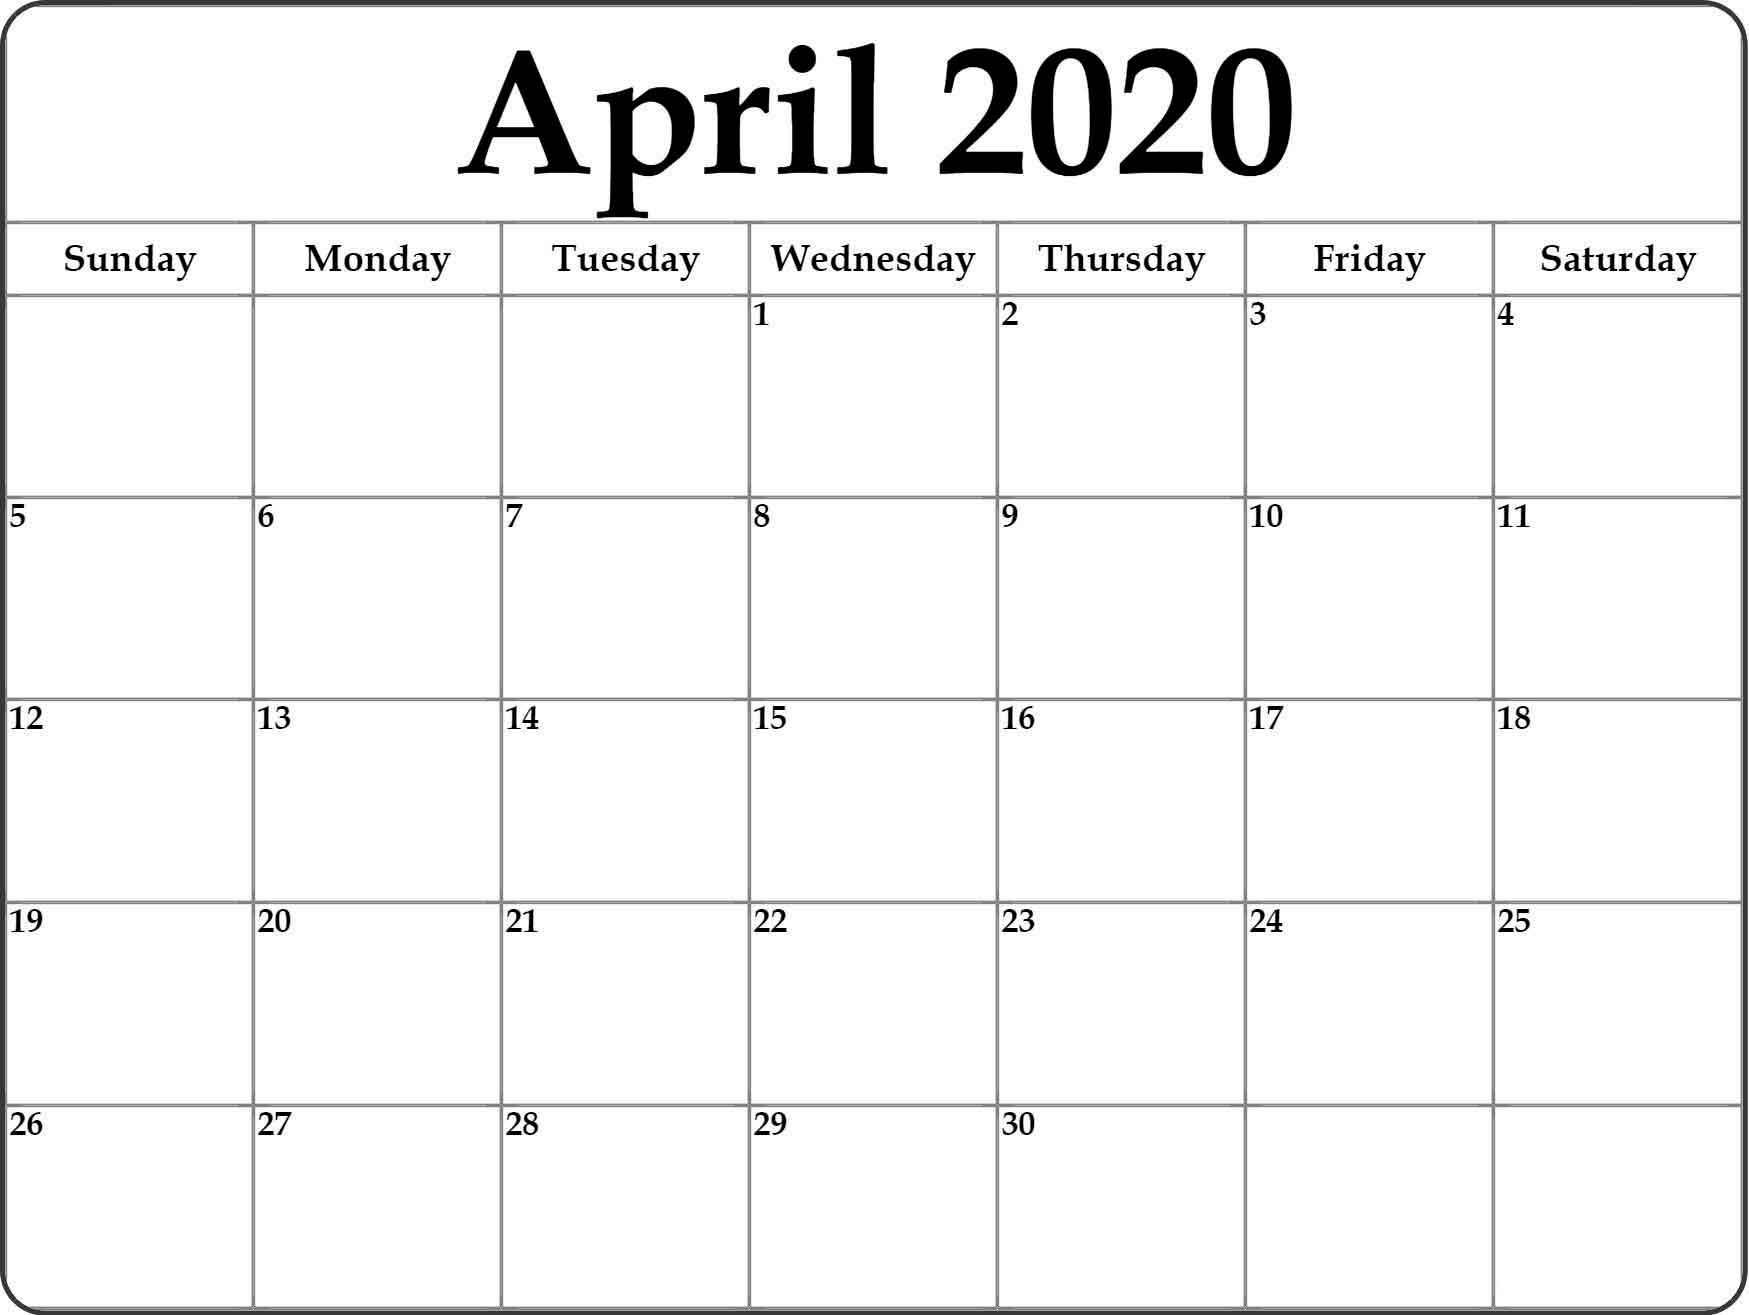 Google Calendar April 2020 - Free Printable Calendar Templates inside Google Free Printable Calendars 2020